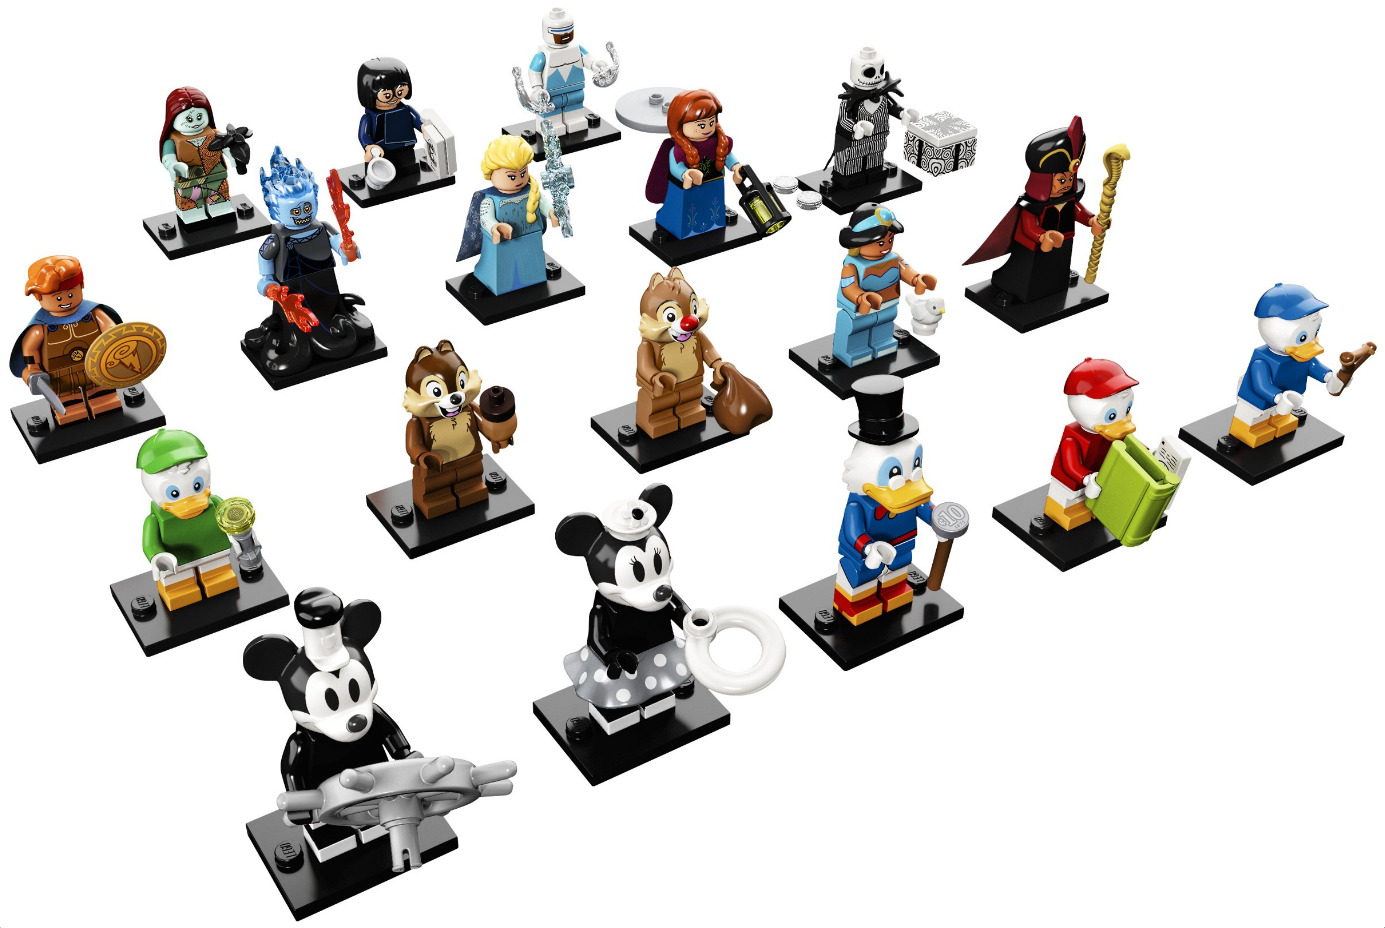 LEGO Minifigures - Disney Series 2 (20 blind bag pack) image